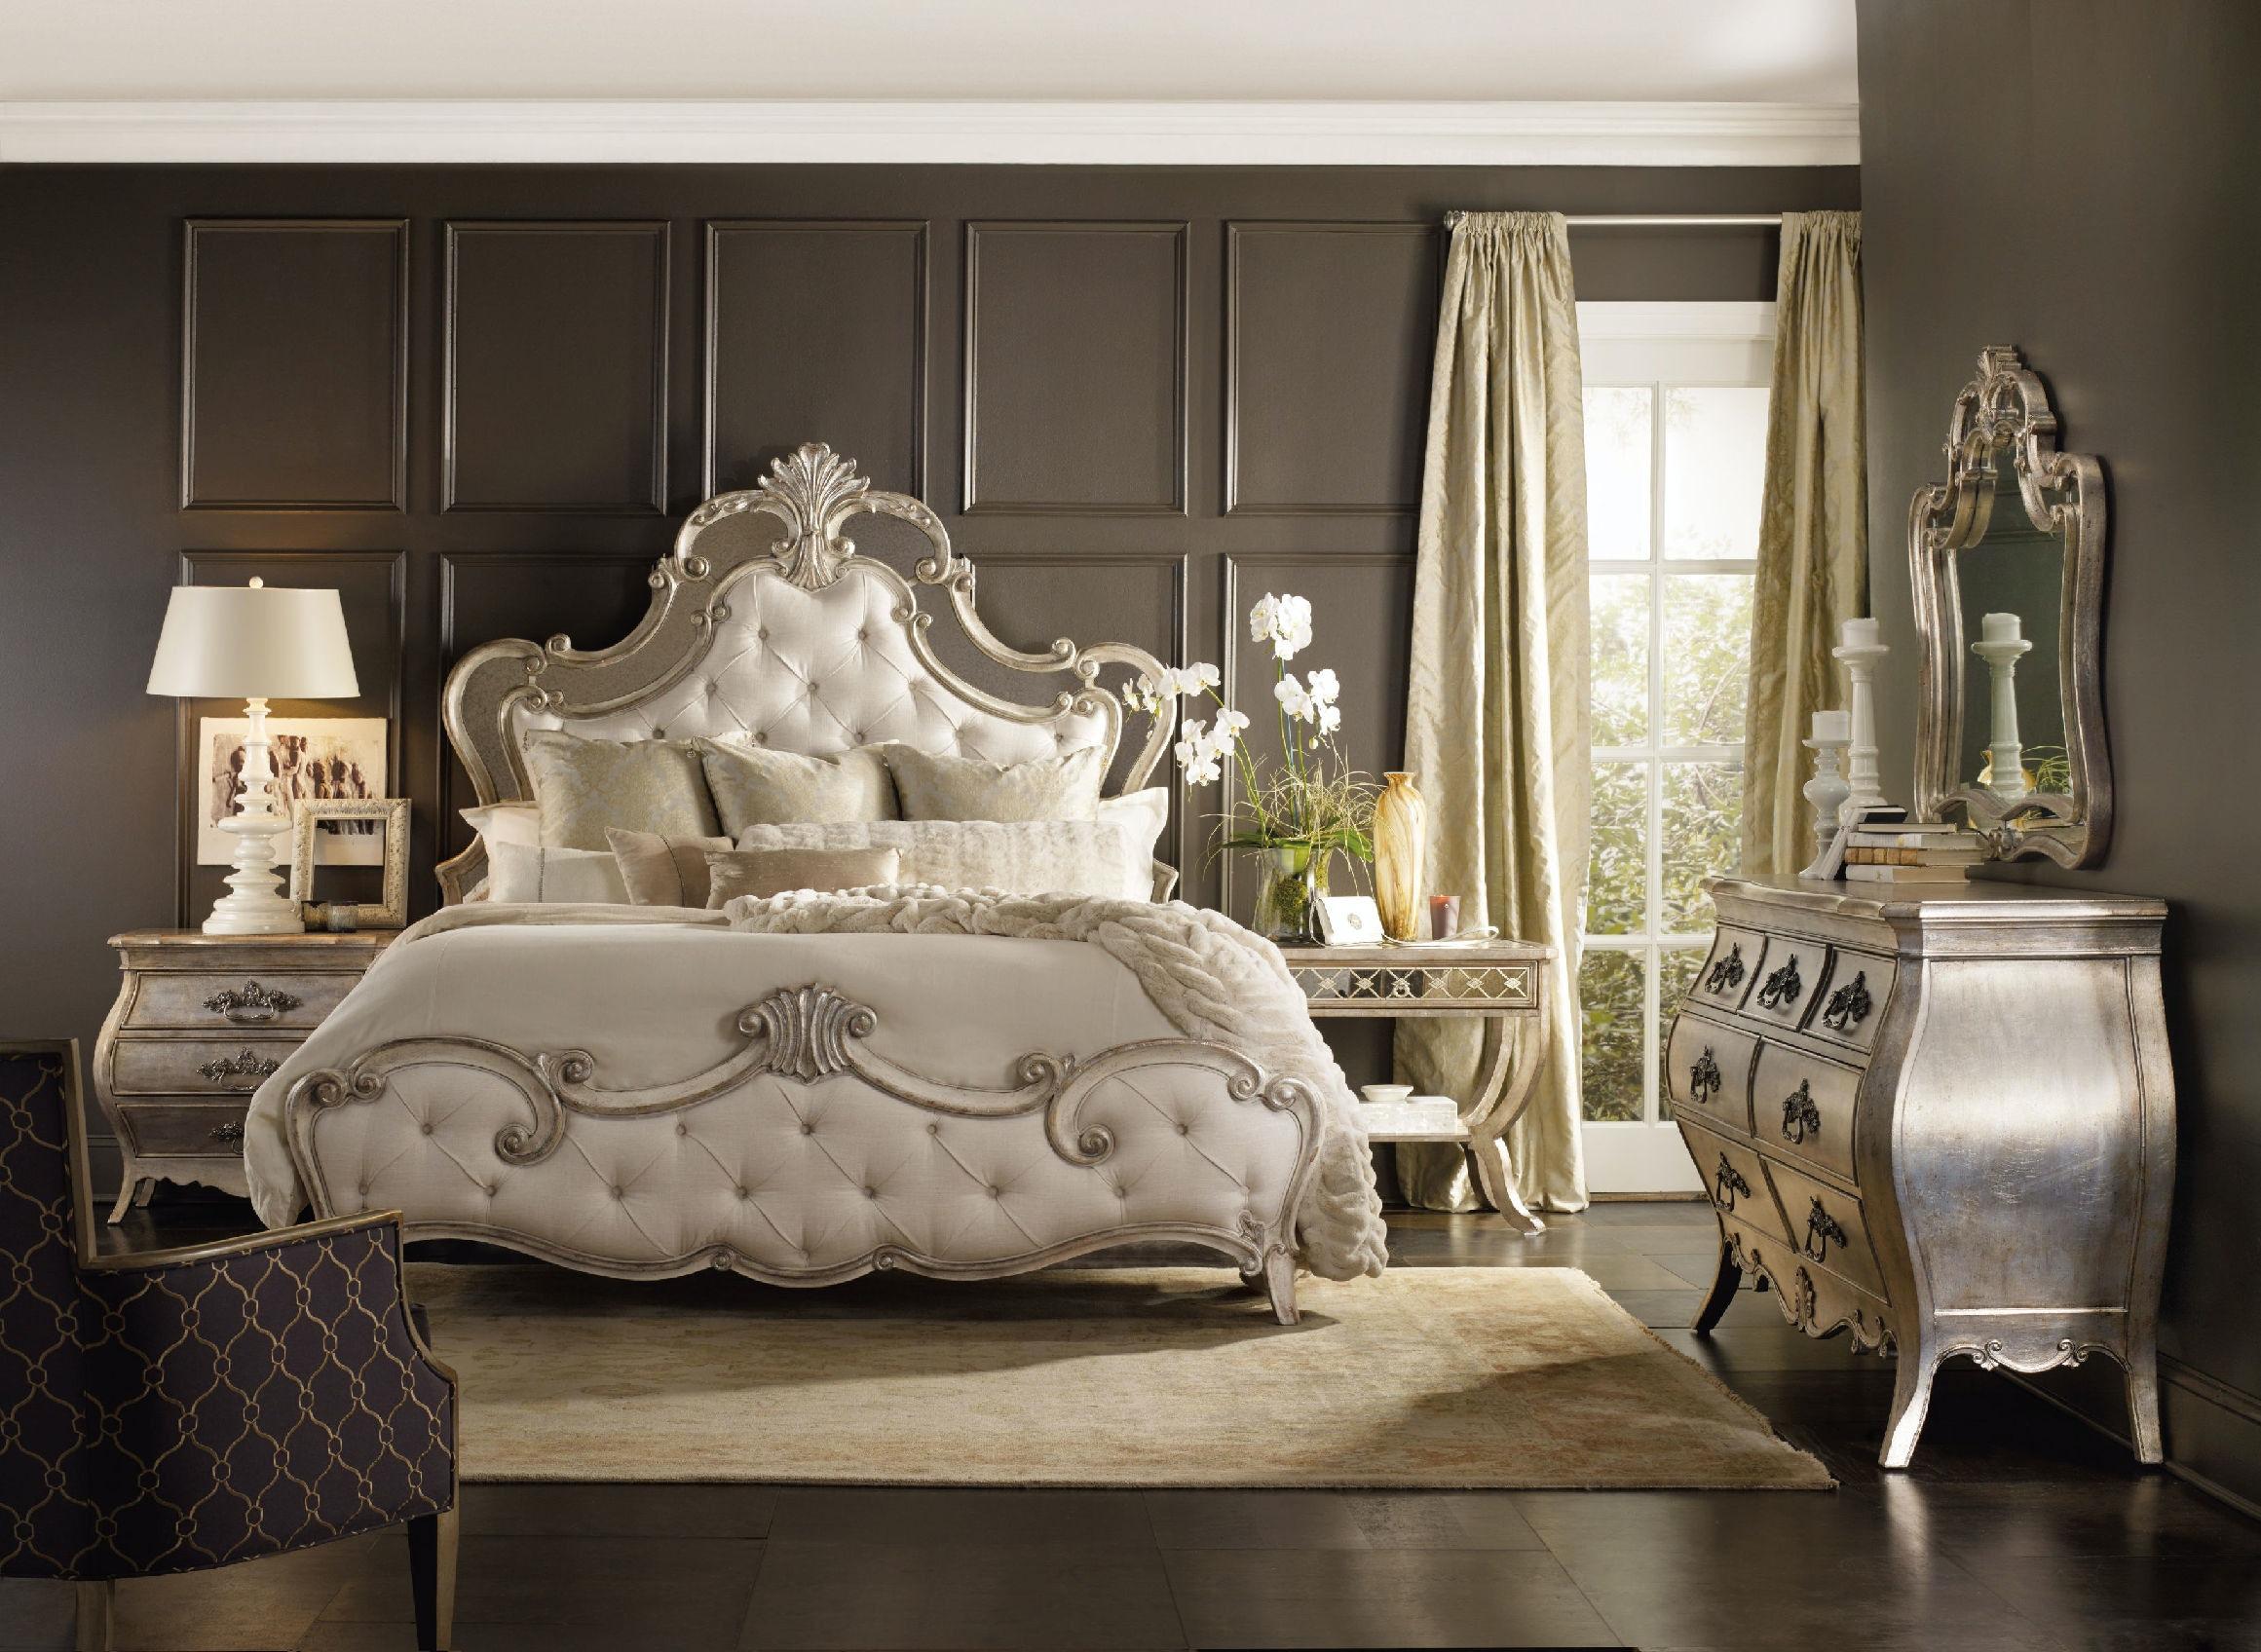 Hooker Furniture Sanctuary Queen Upholstered Bed 5413 90850